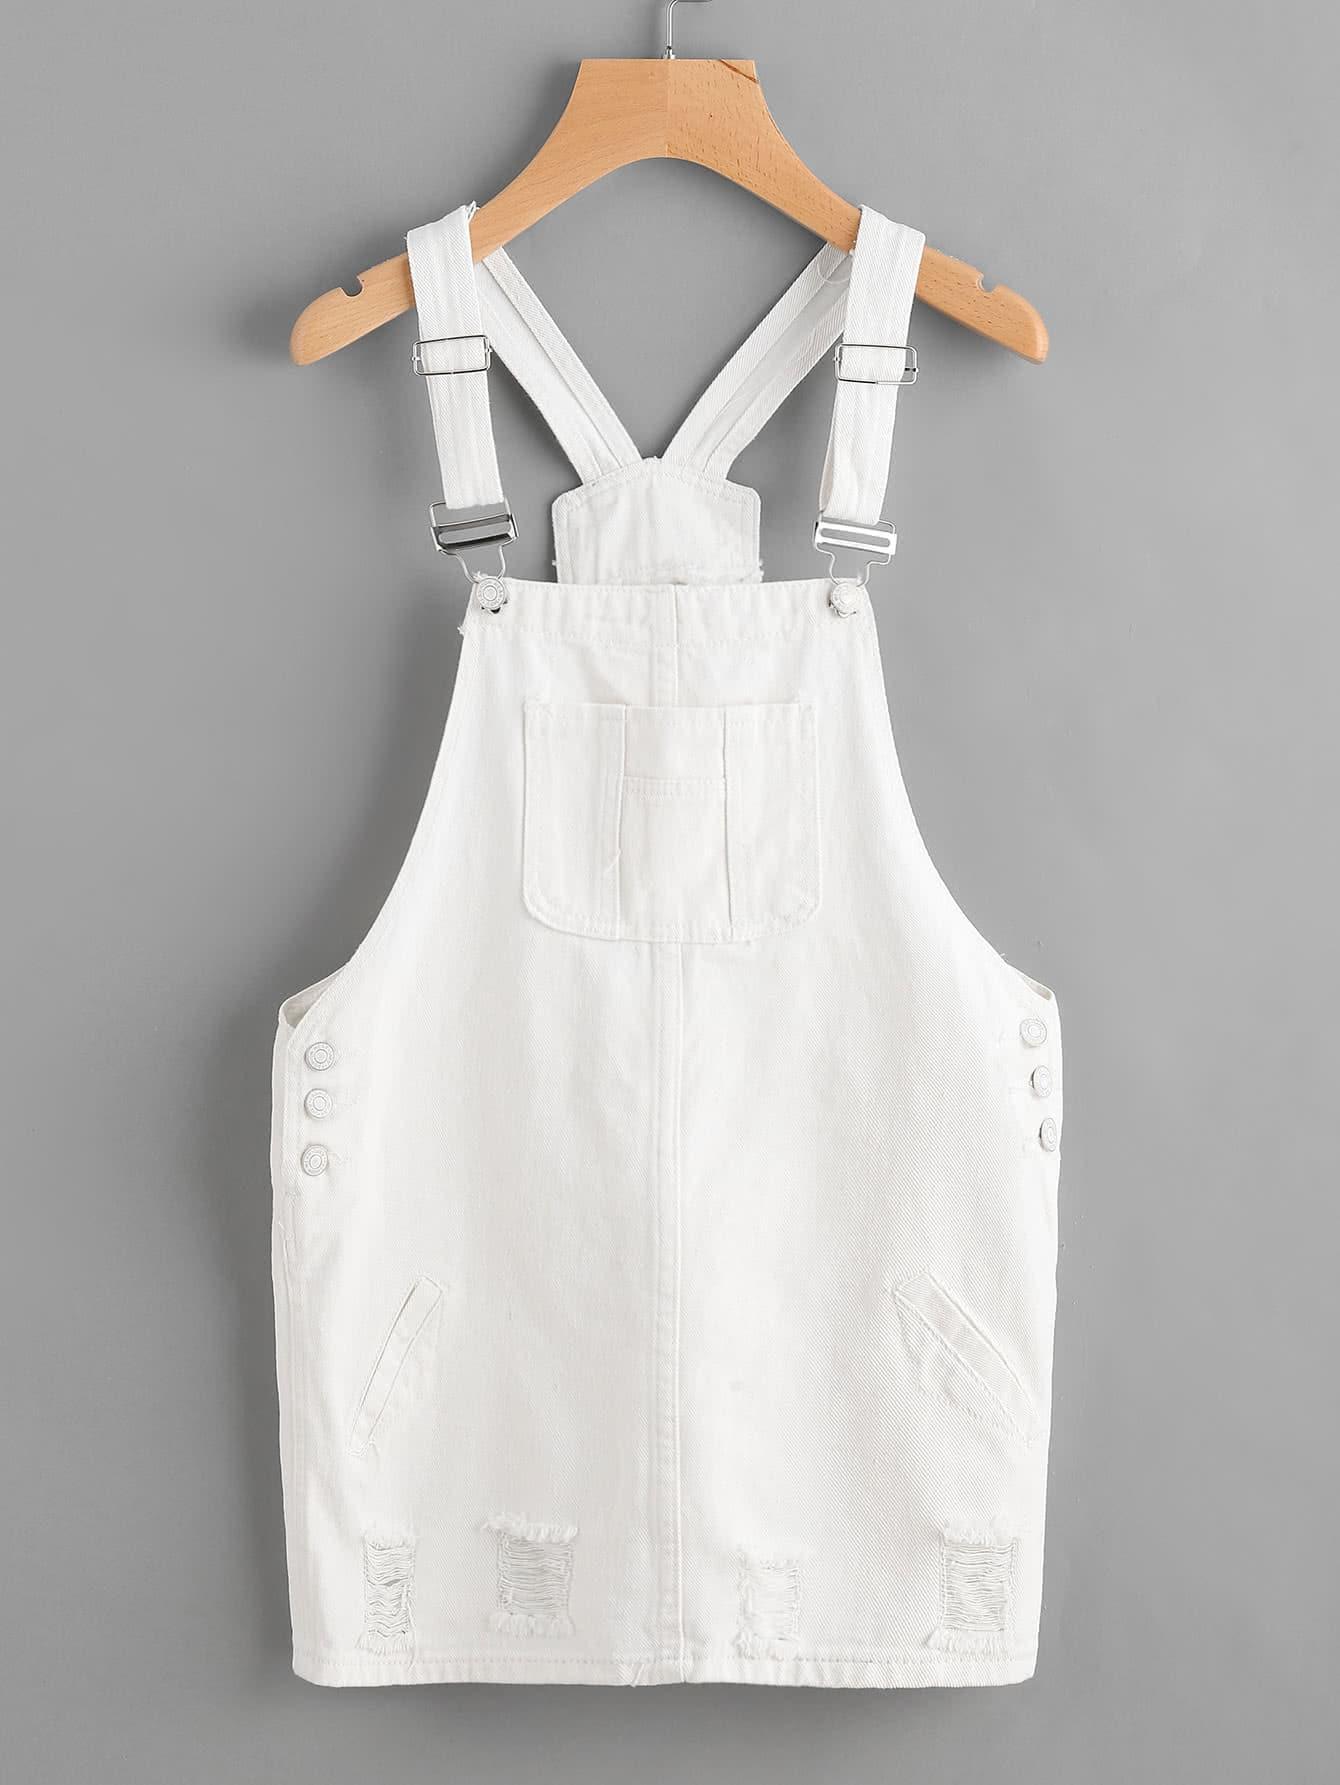 Badge Denim Overall Dress With Pockets dress170524003